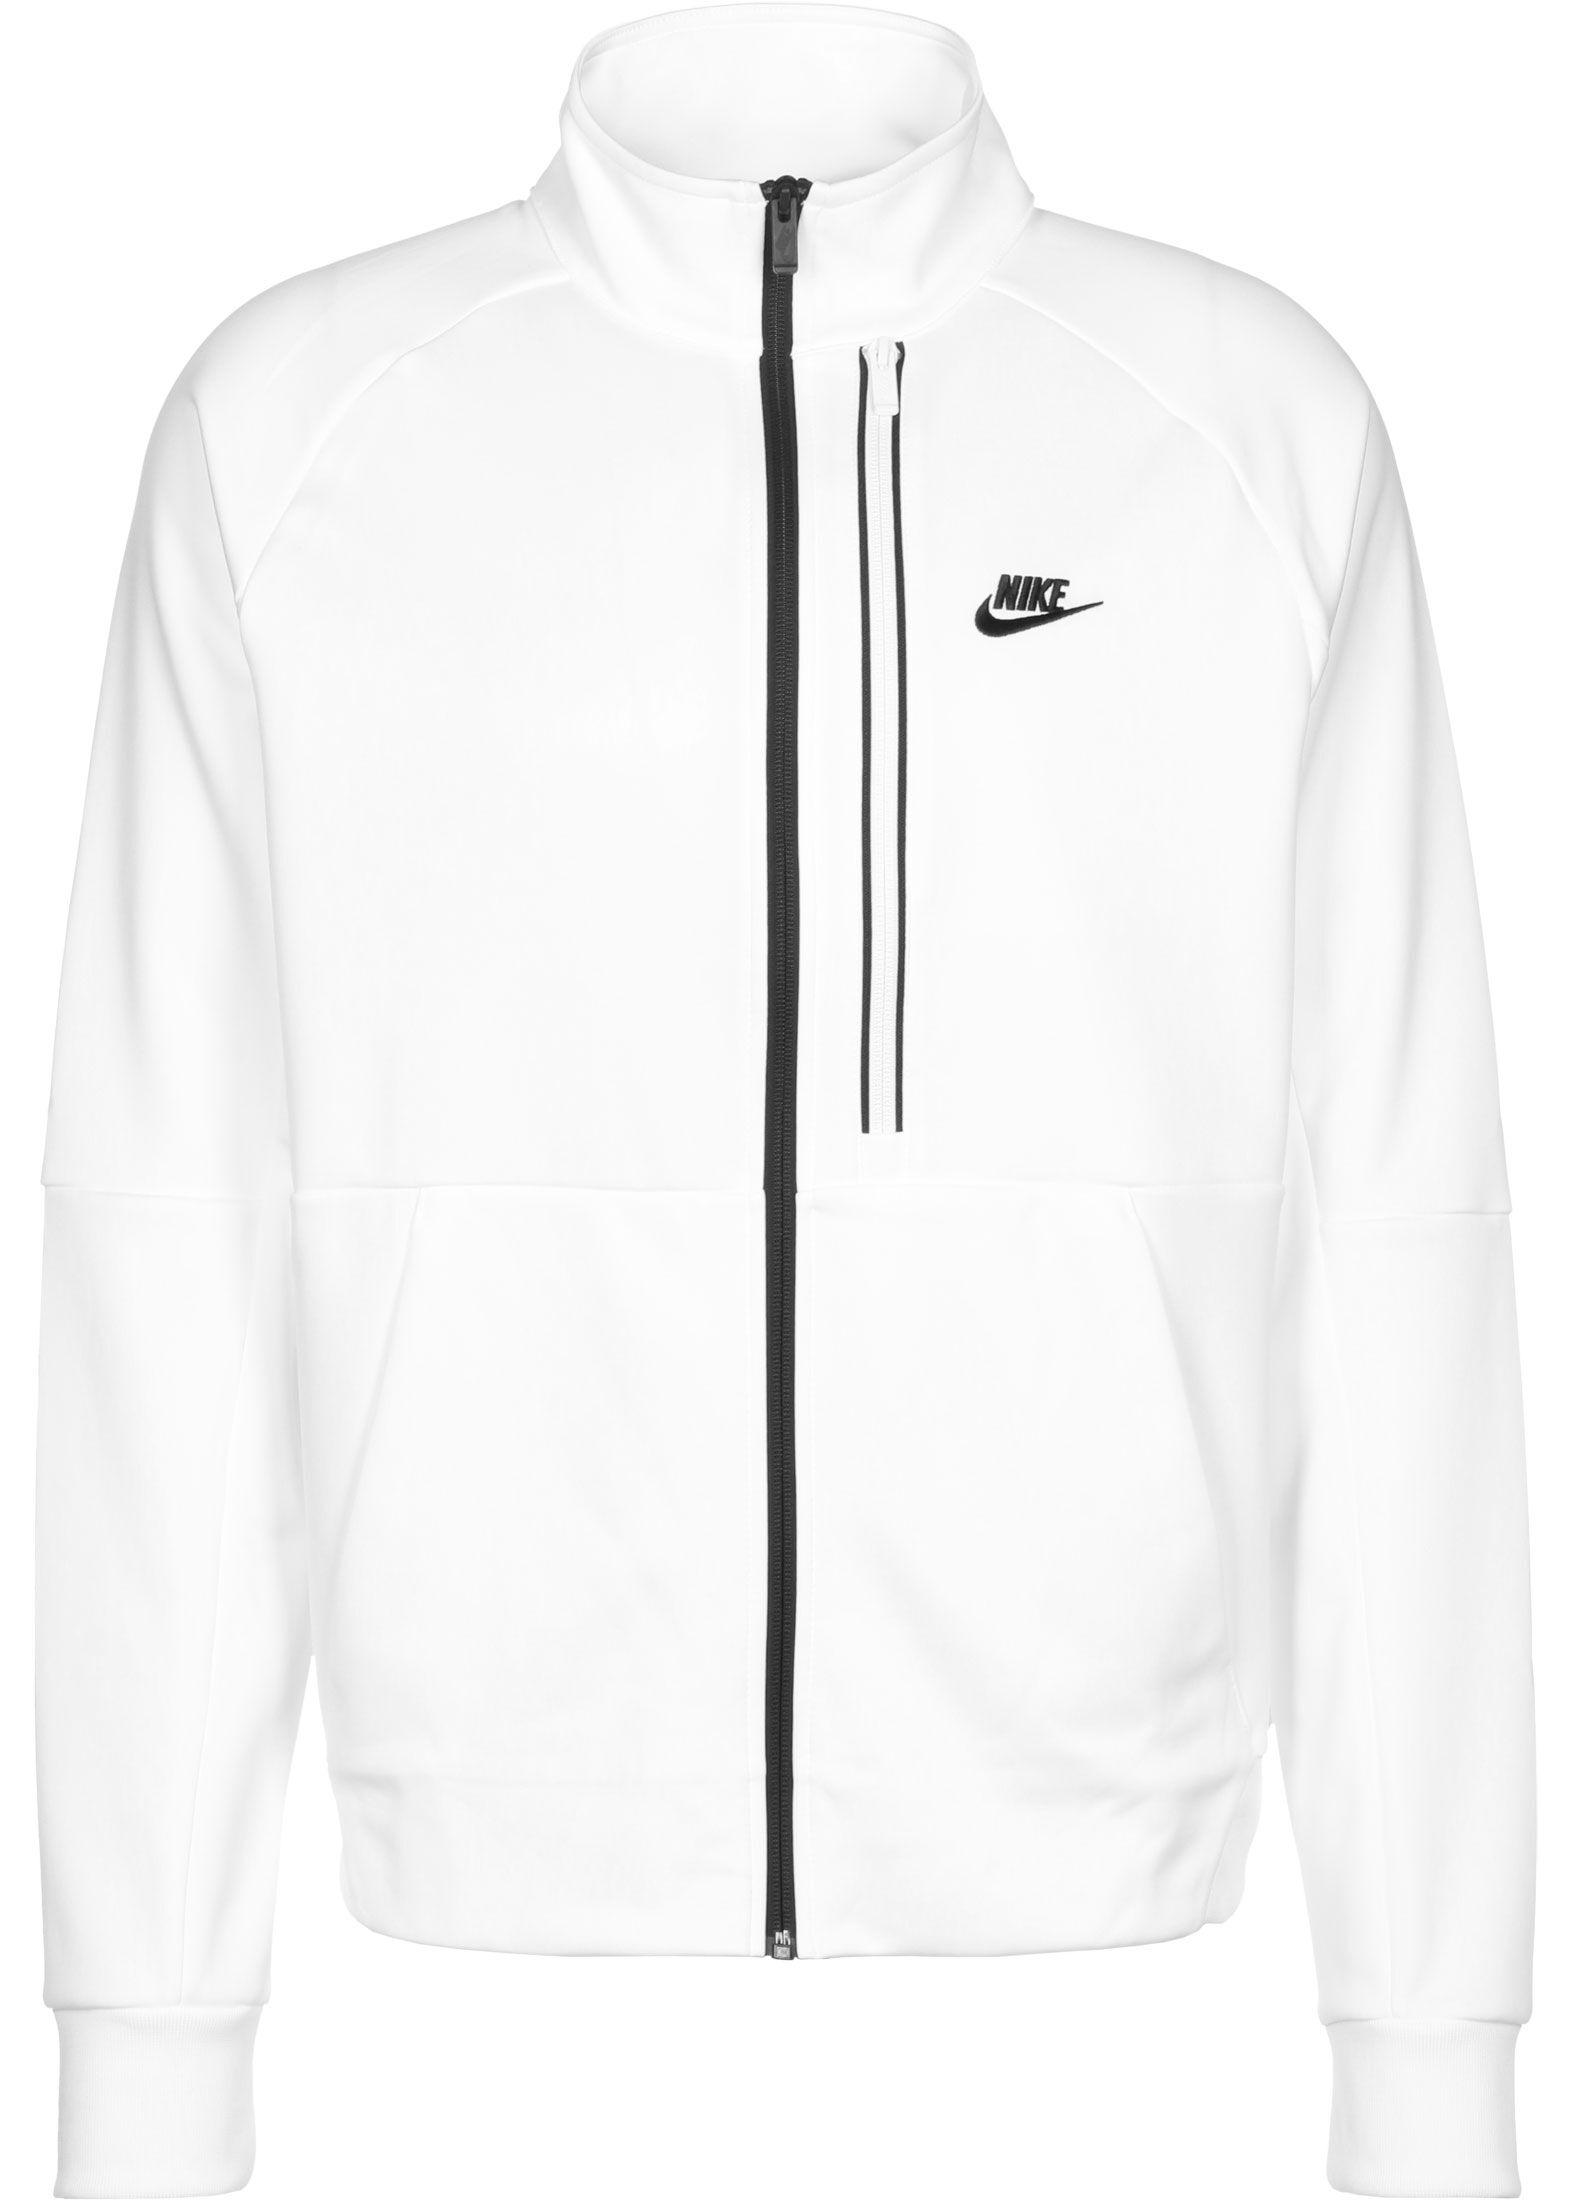 Nike Te N98 Tribute, taille XL, homme, blanc